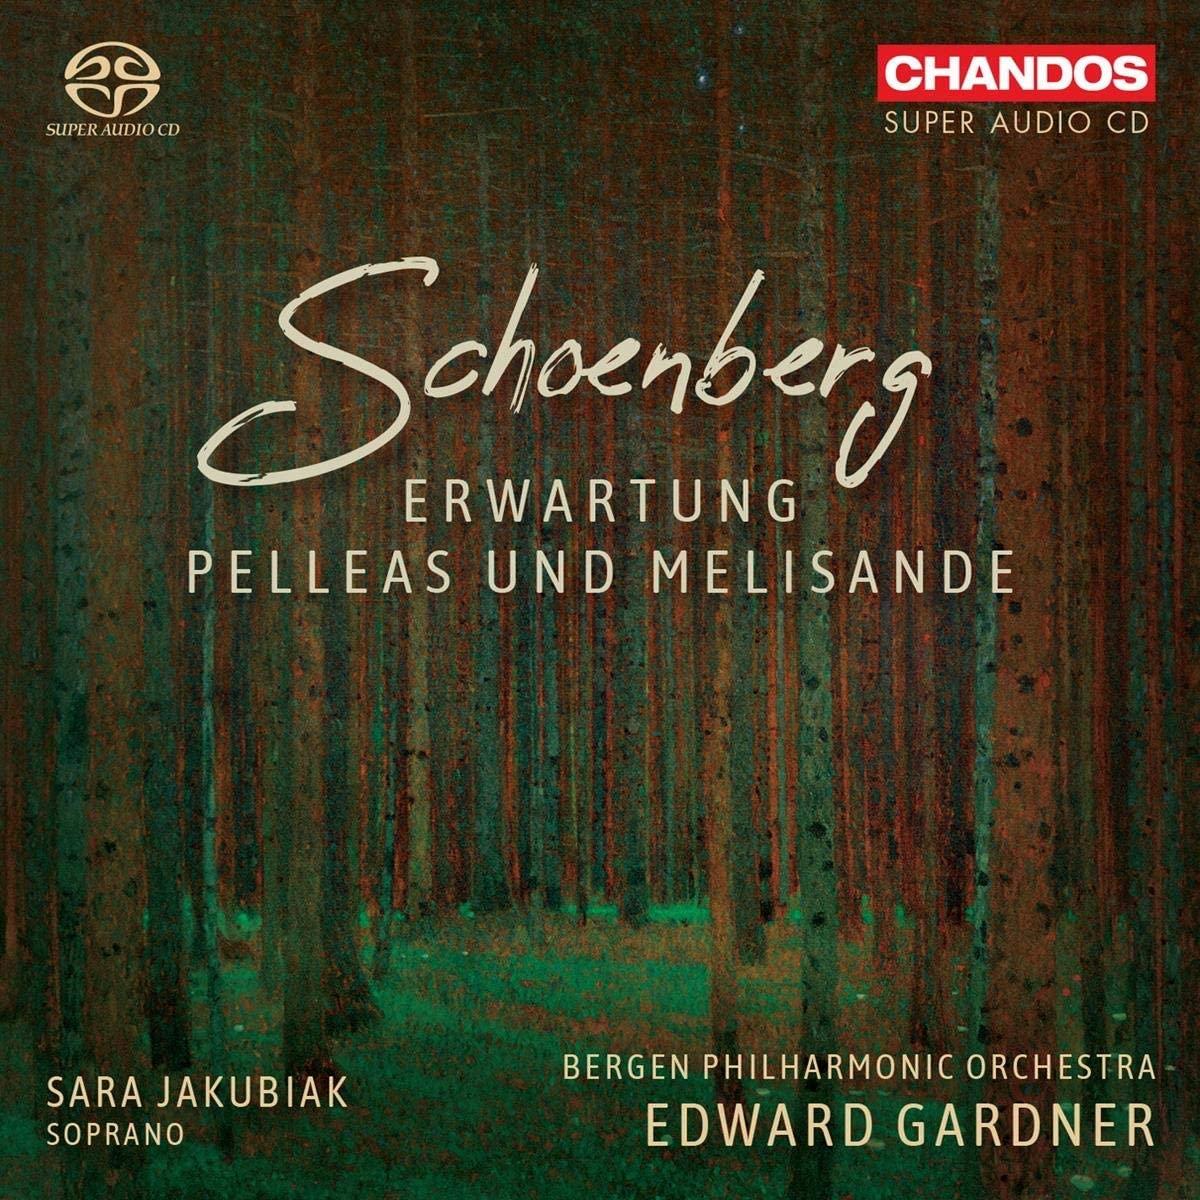 Review of SCHOENBERG Erwartung. Pelleas und Melisande